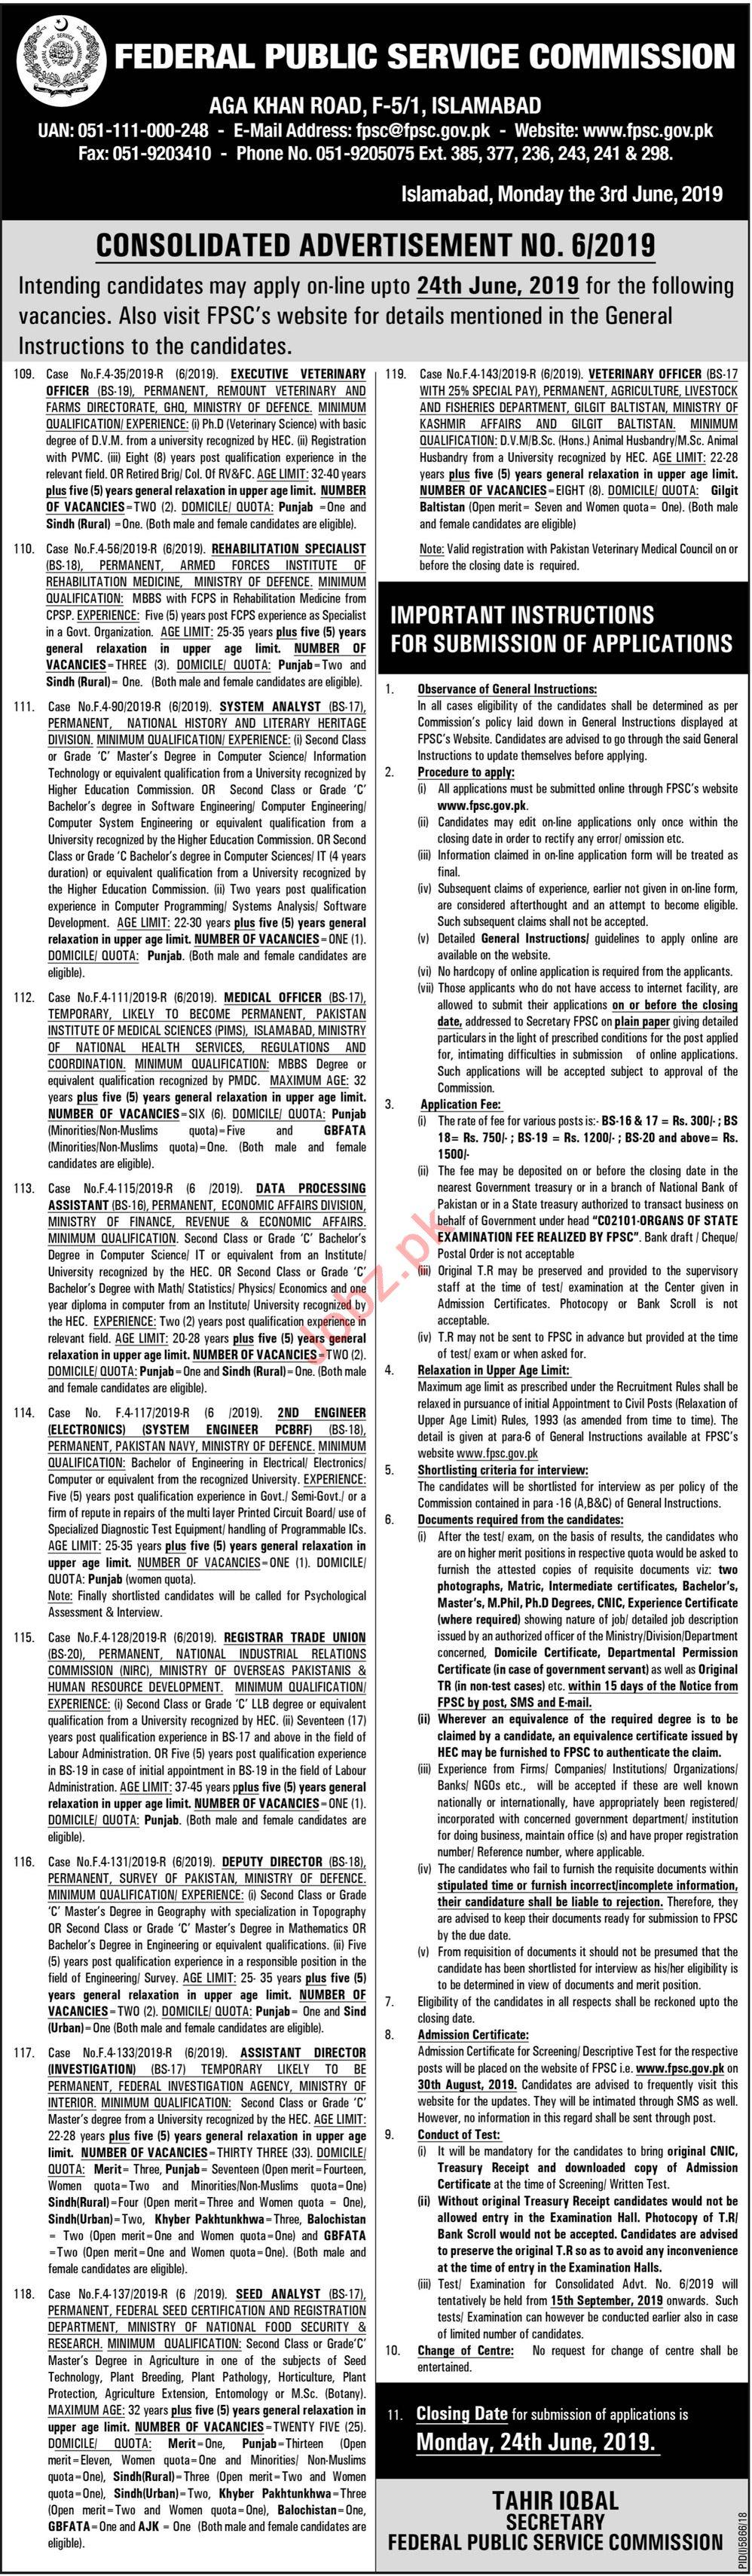 FPSC Jobs in Islamabad 2019